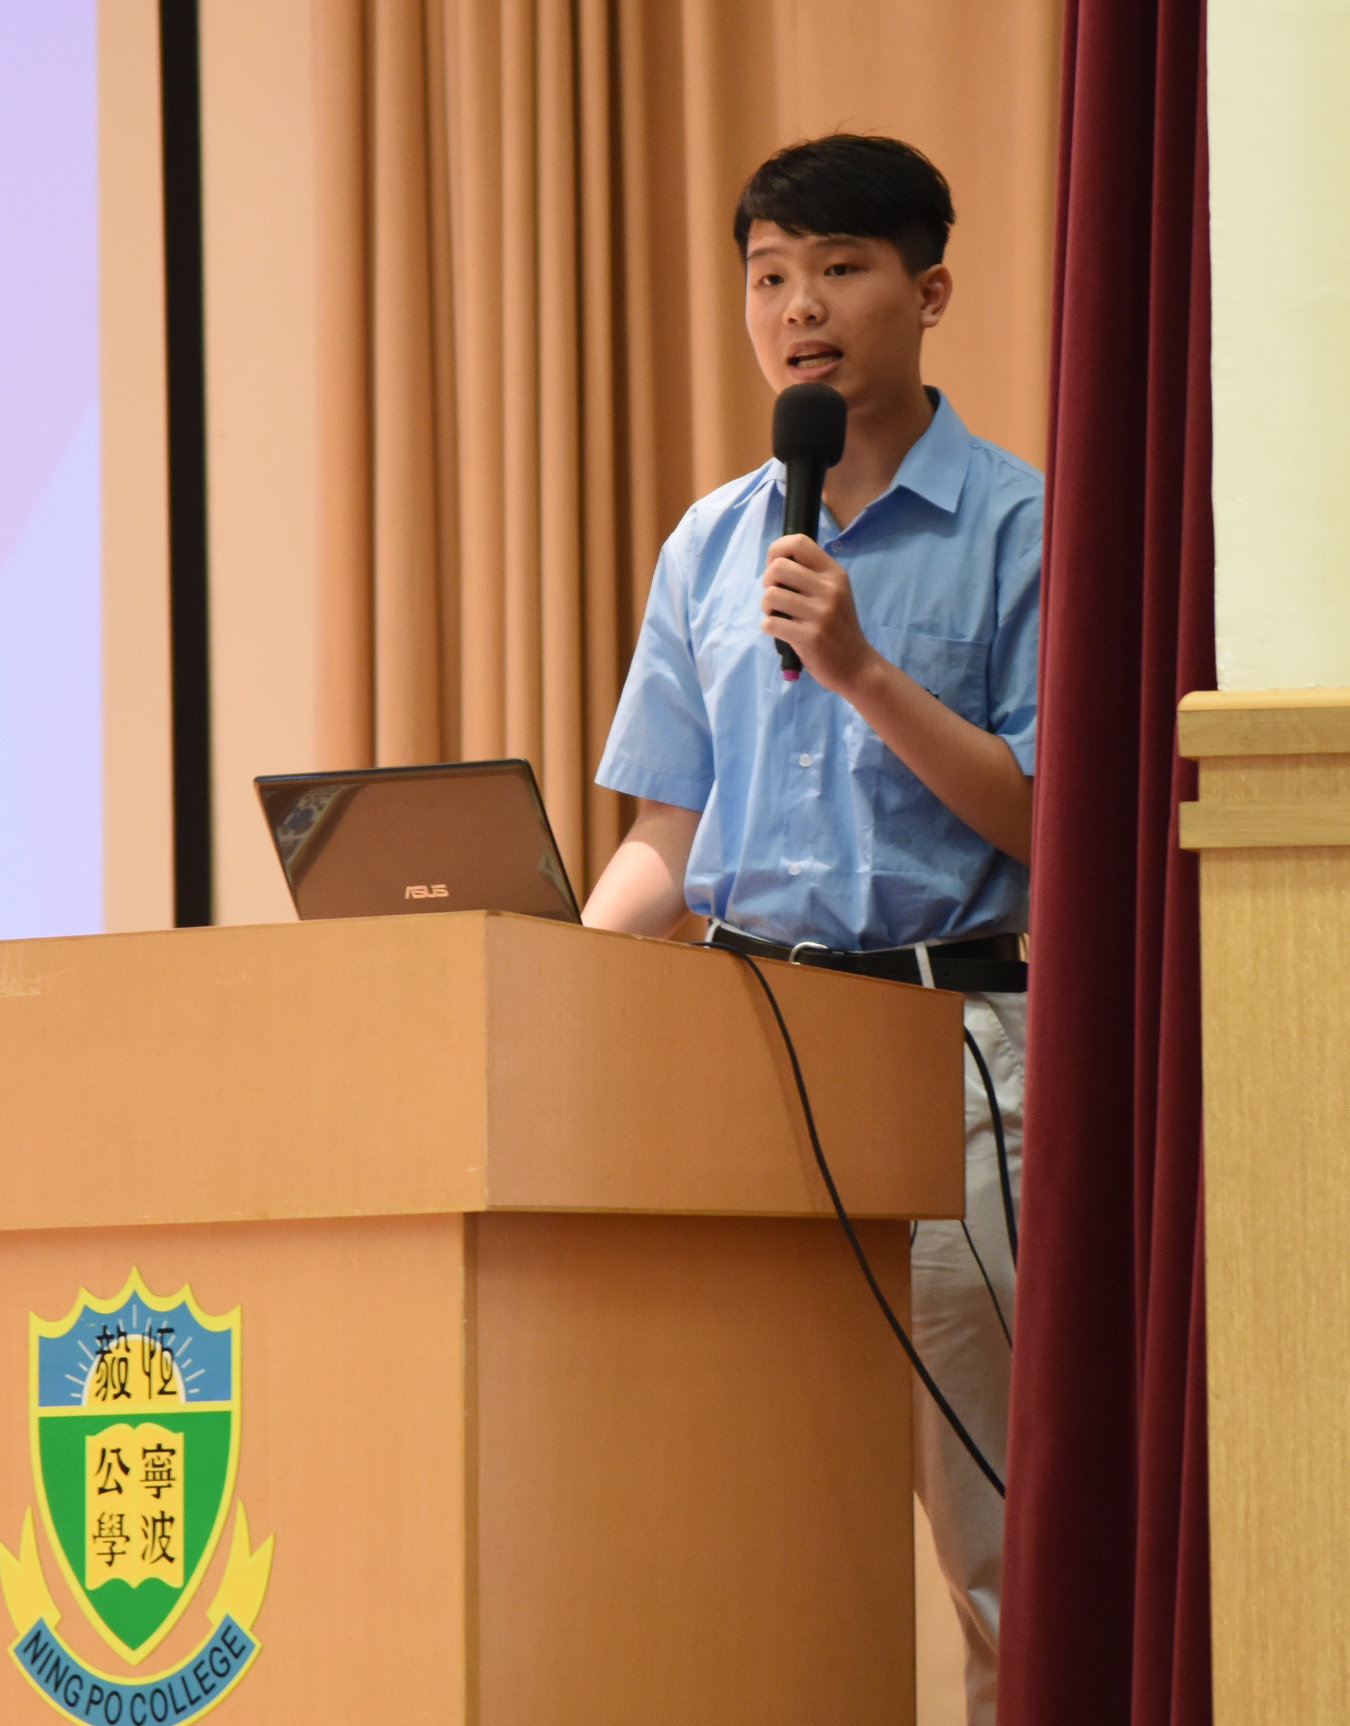 http://www.npc.edu.hk/sites/default/files/3_1217.jpg